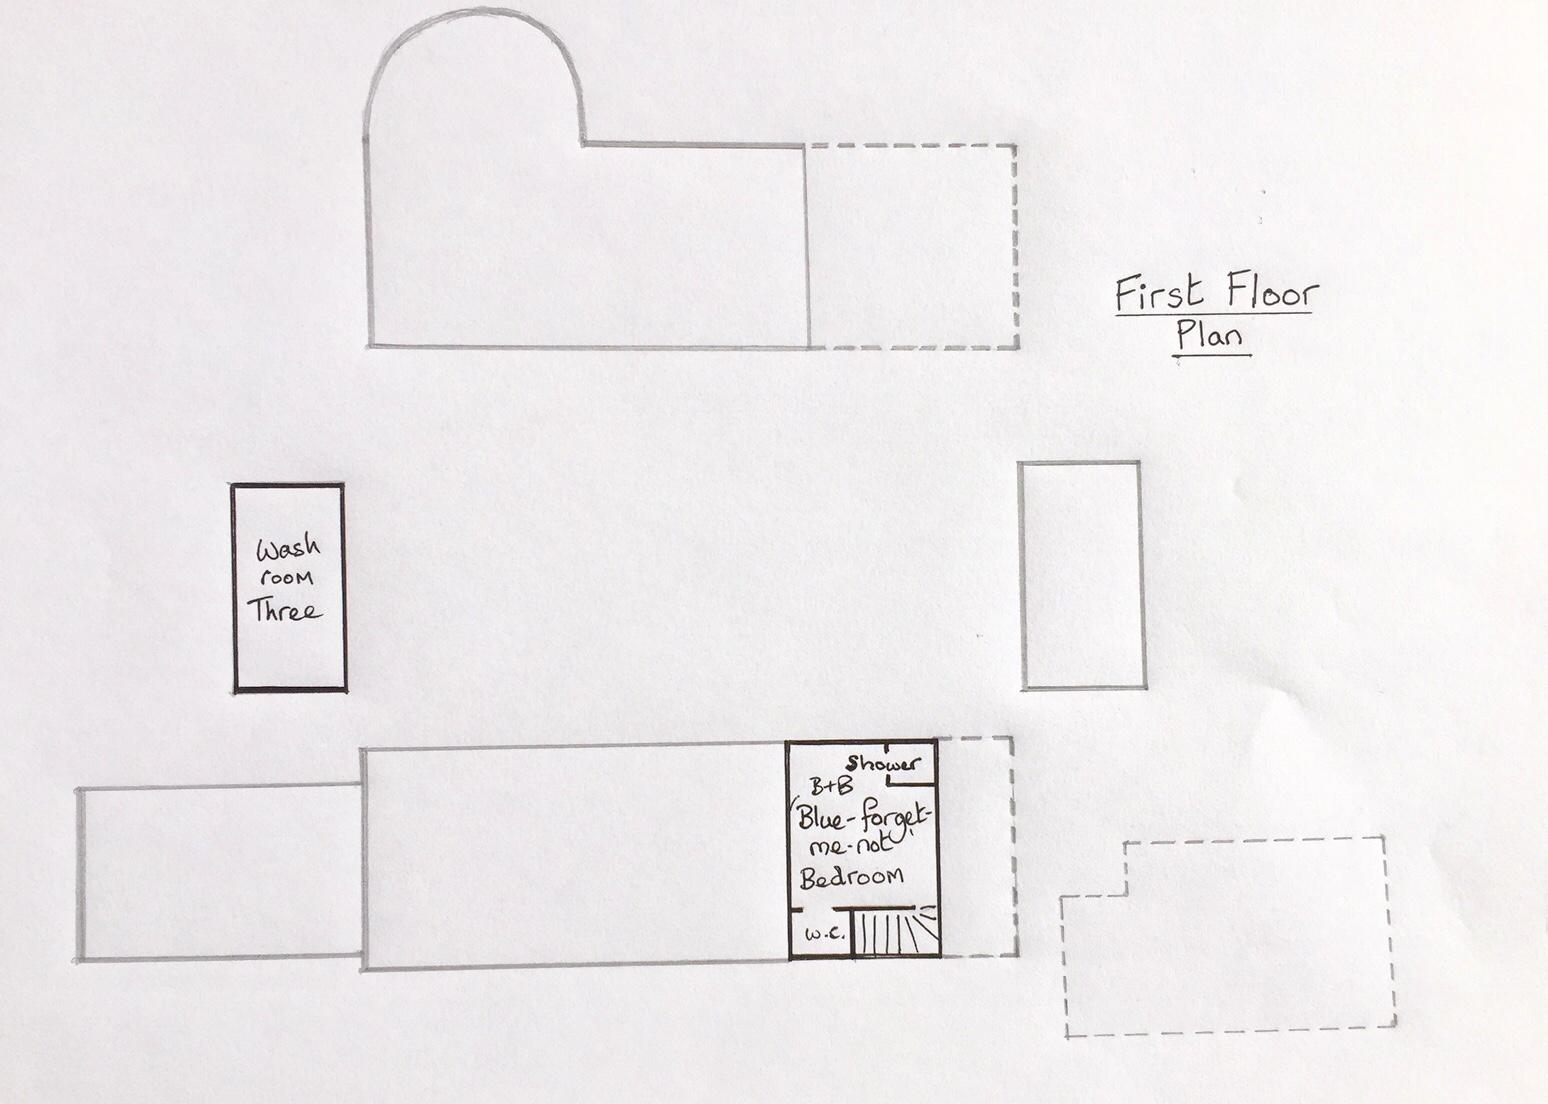 First floor room layout at Huxtable Farm B&B